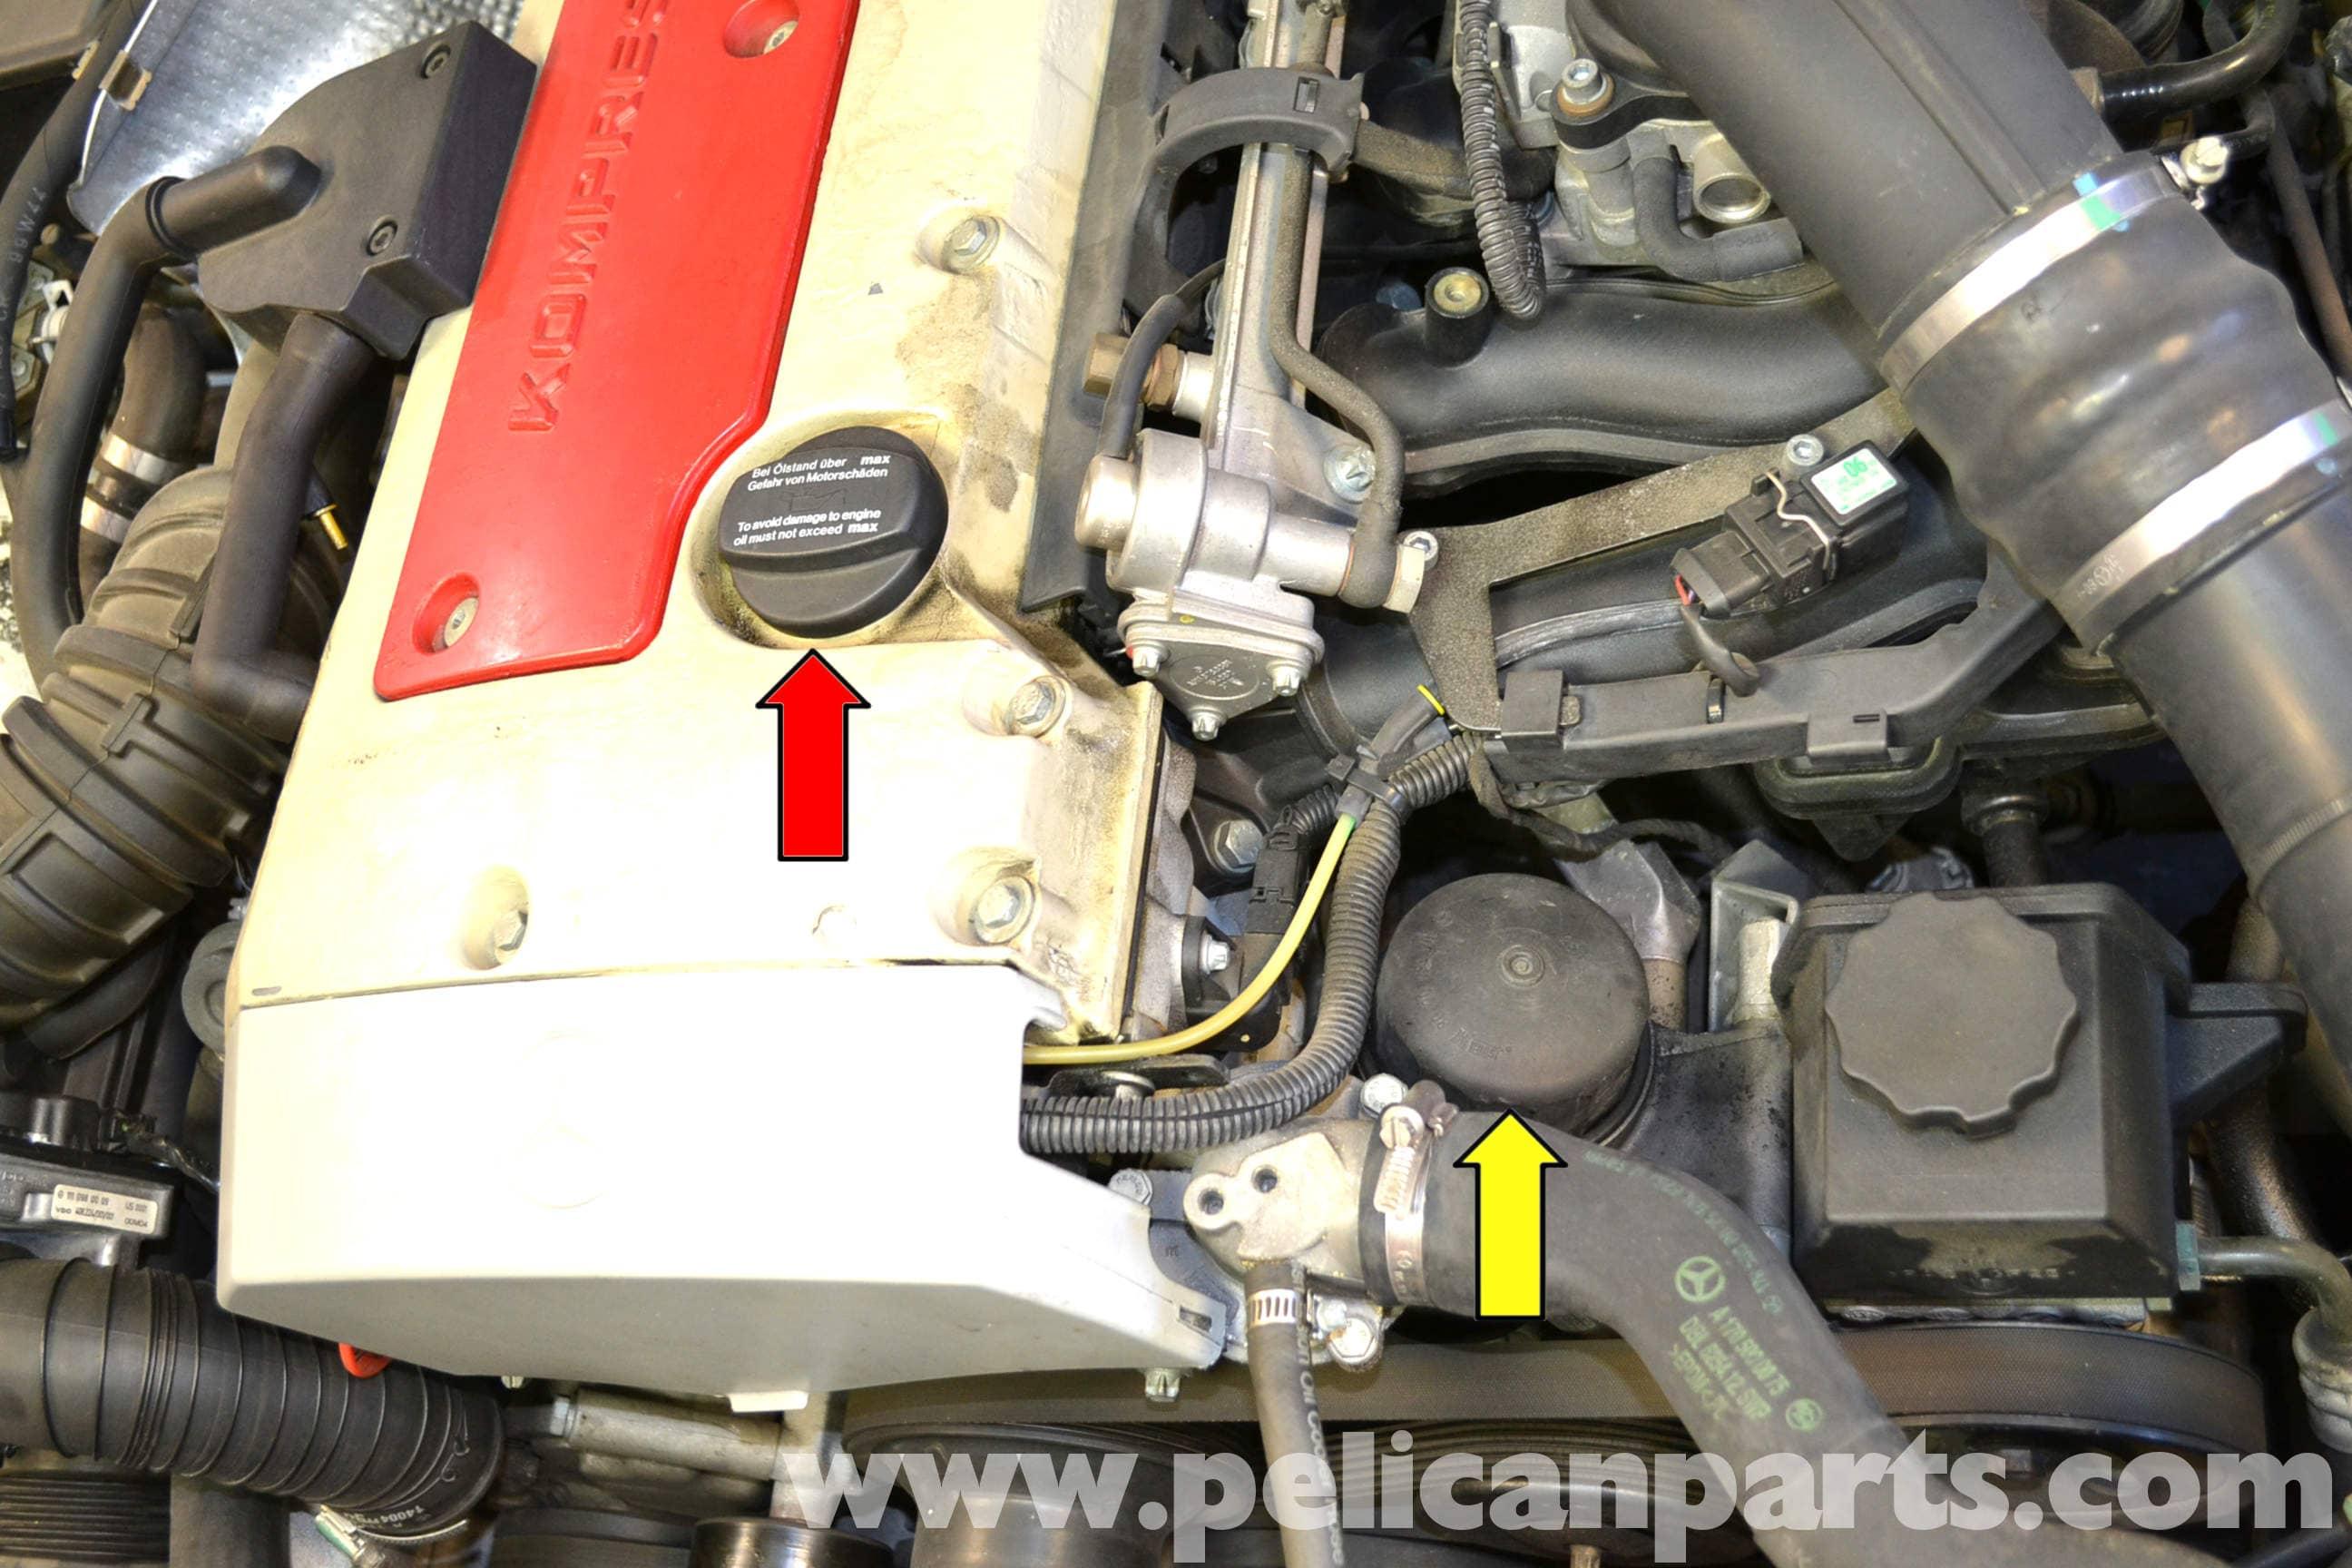 Oil Filter Housing Gasket >> Mercedes-Benz SLK 230 Oil Change | 1998-2004 | Pelican Parts DIY Maintenance Article